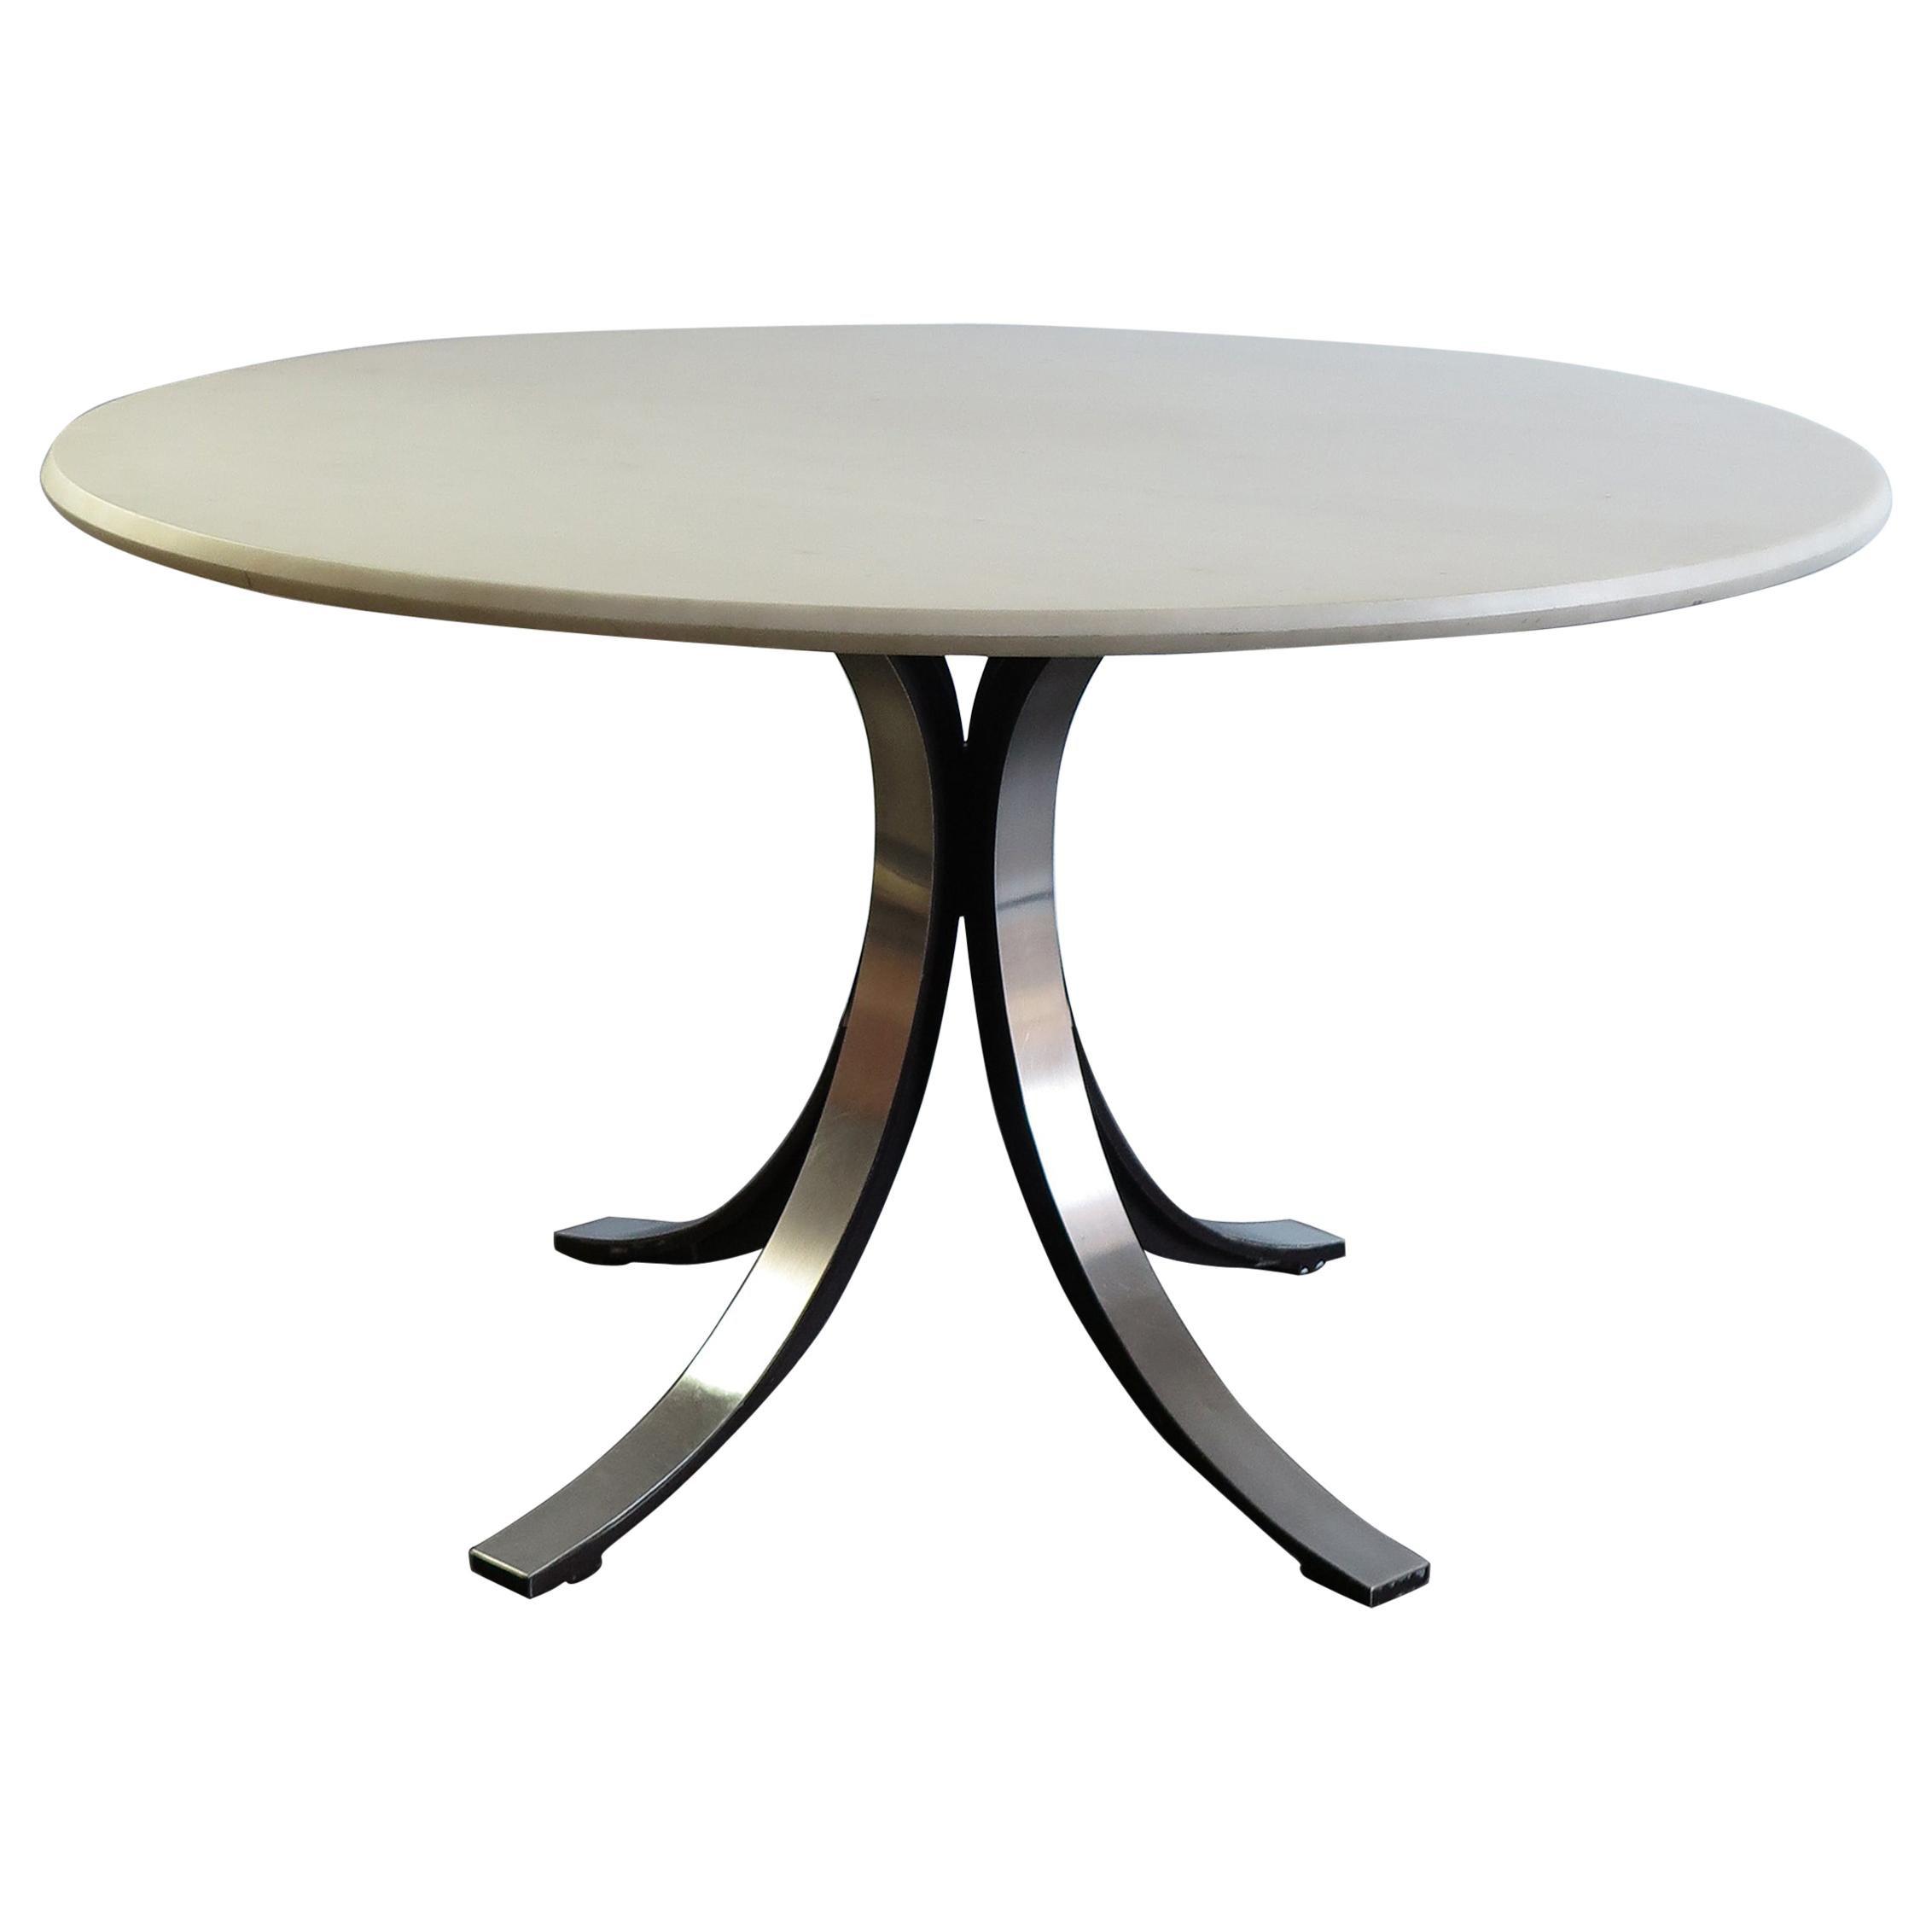 "Osvaldo Borsani and Eugenio Gerli Italian Marble Dining Table ""T69"" for Tecno"